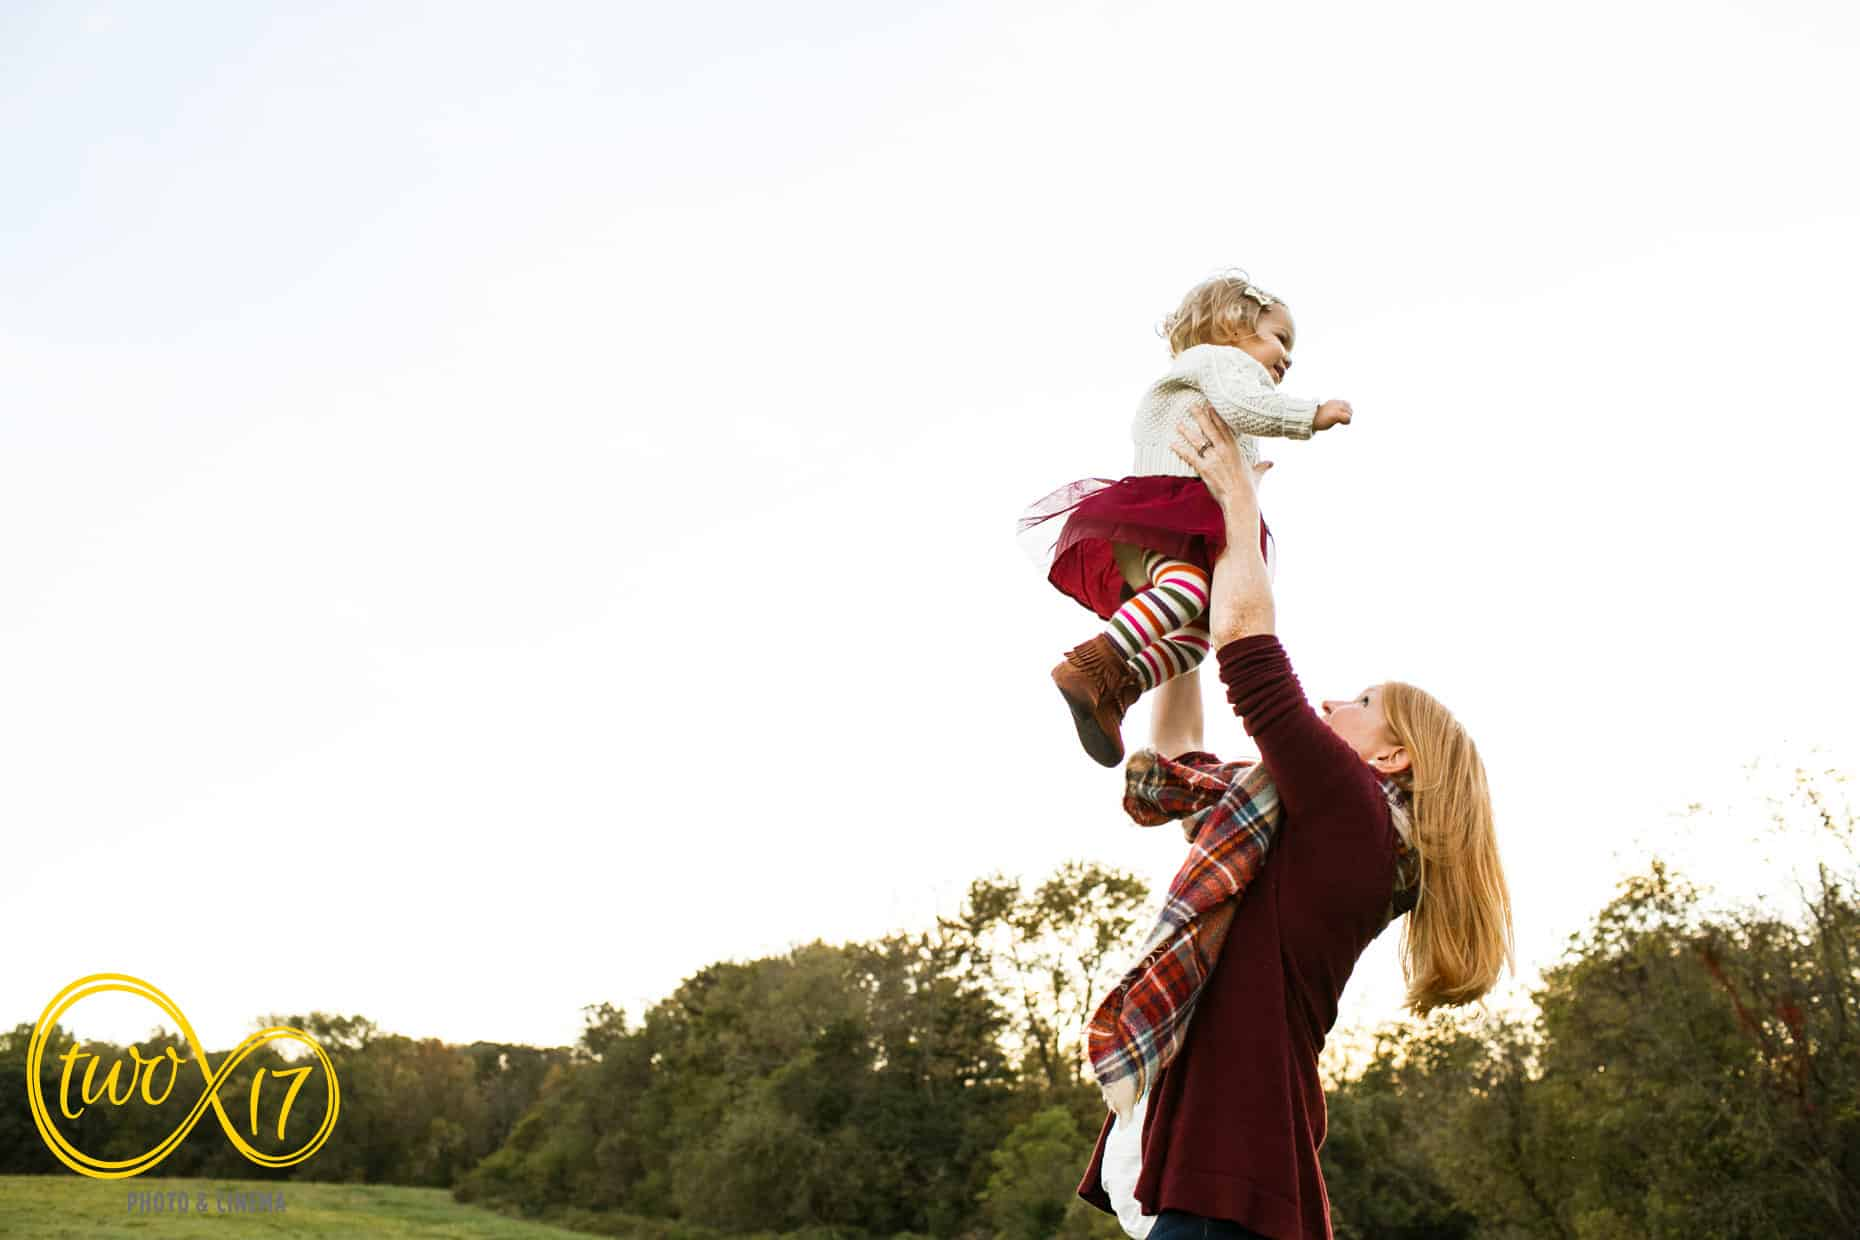 Newtown Bucks County Family Photographer